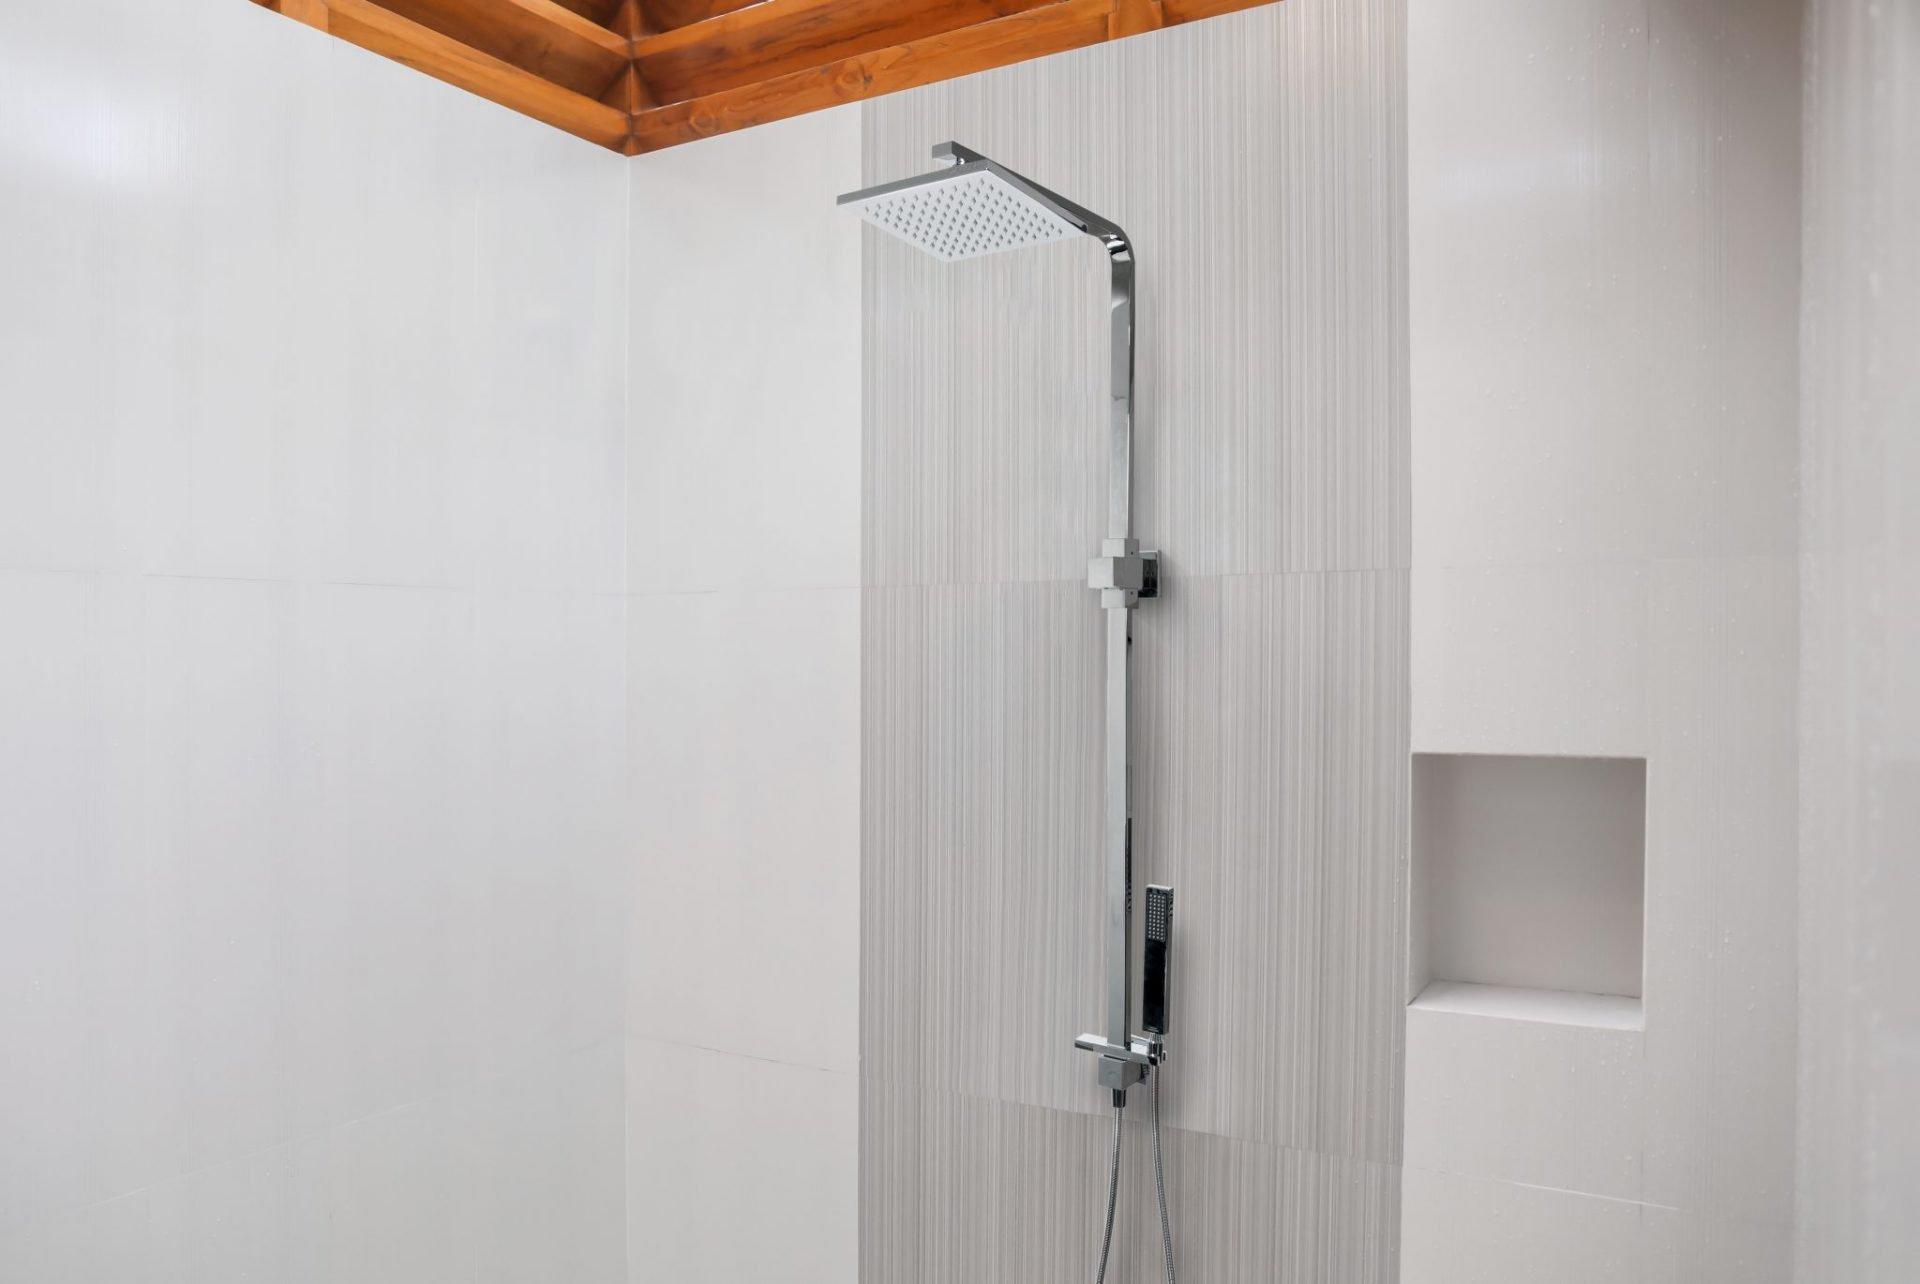 Joseph Exposed Shower Combination